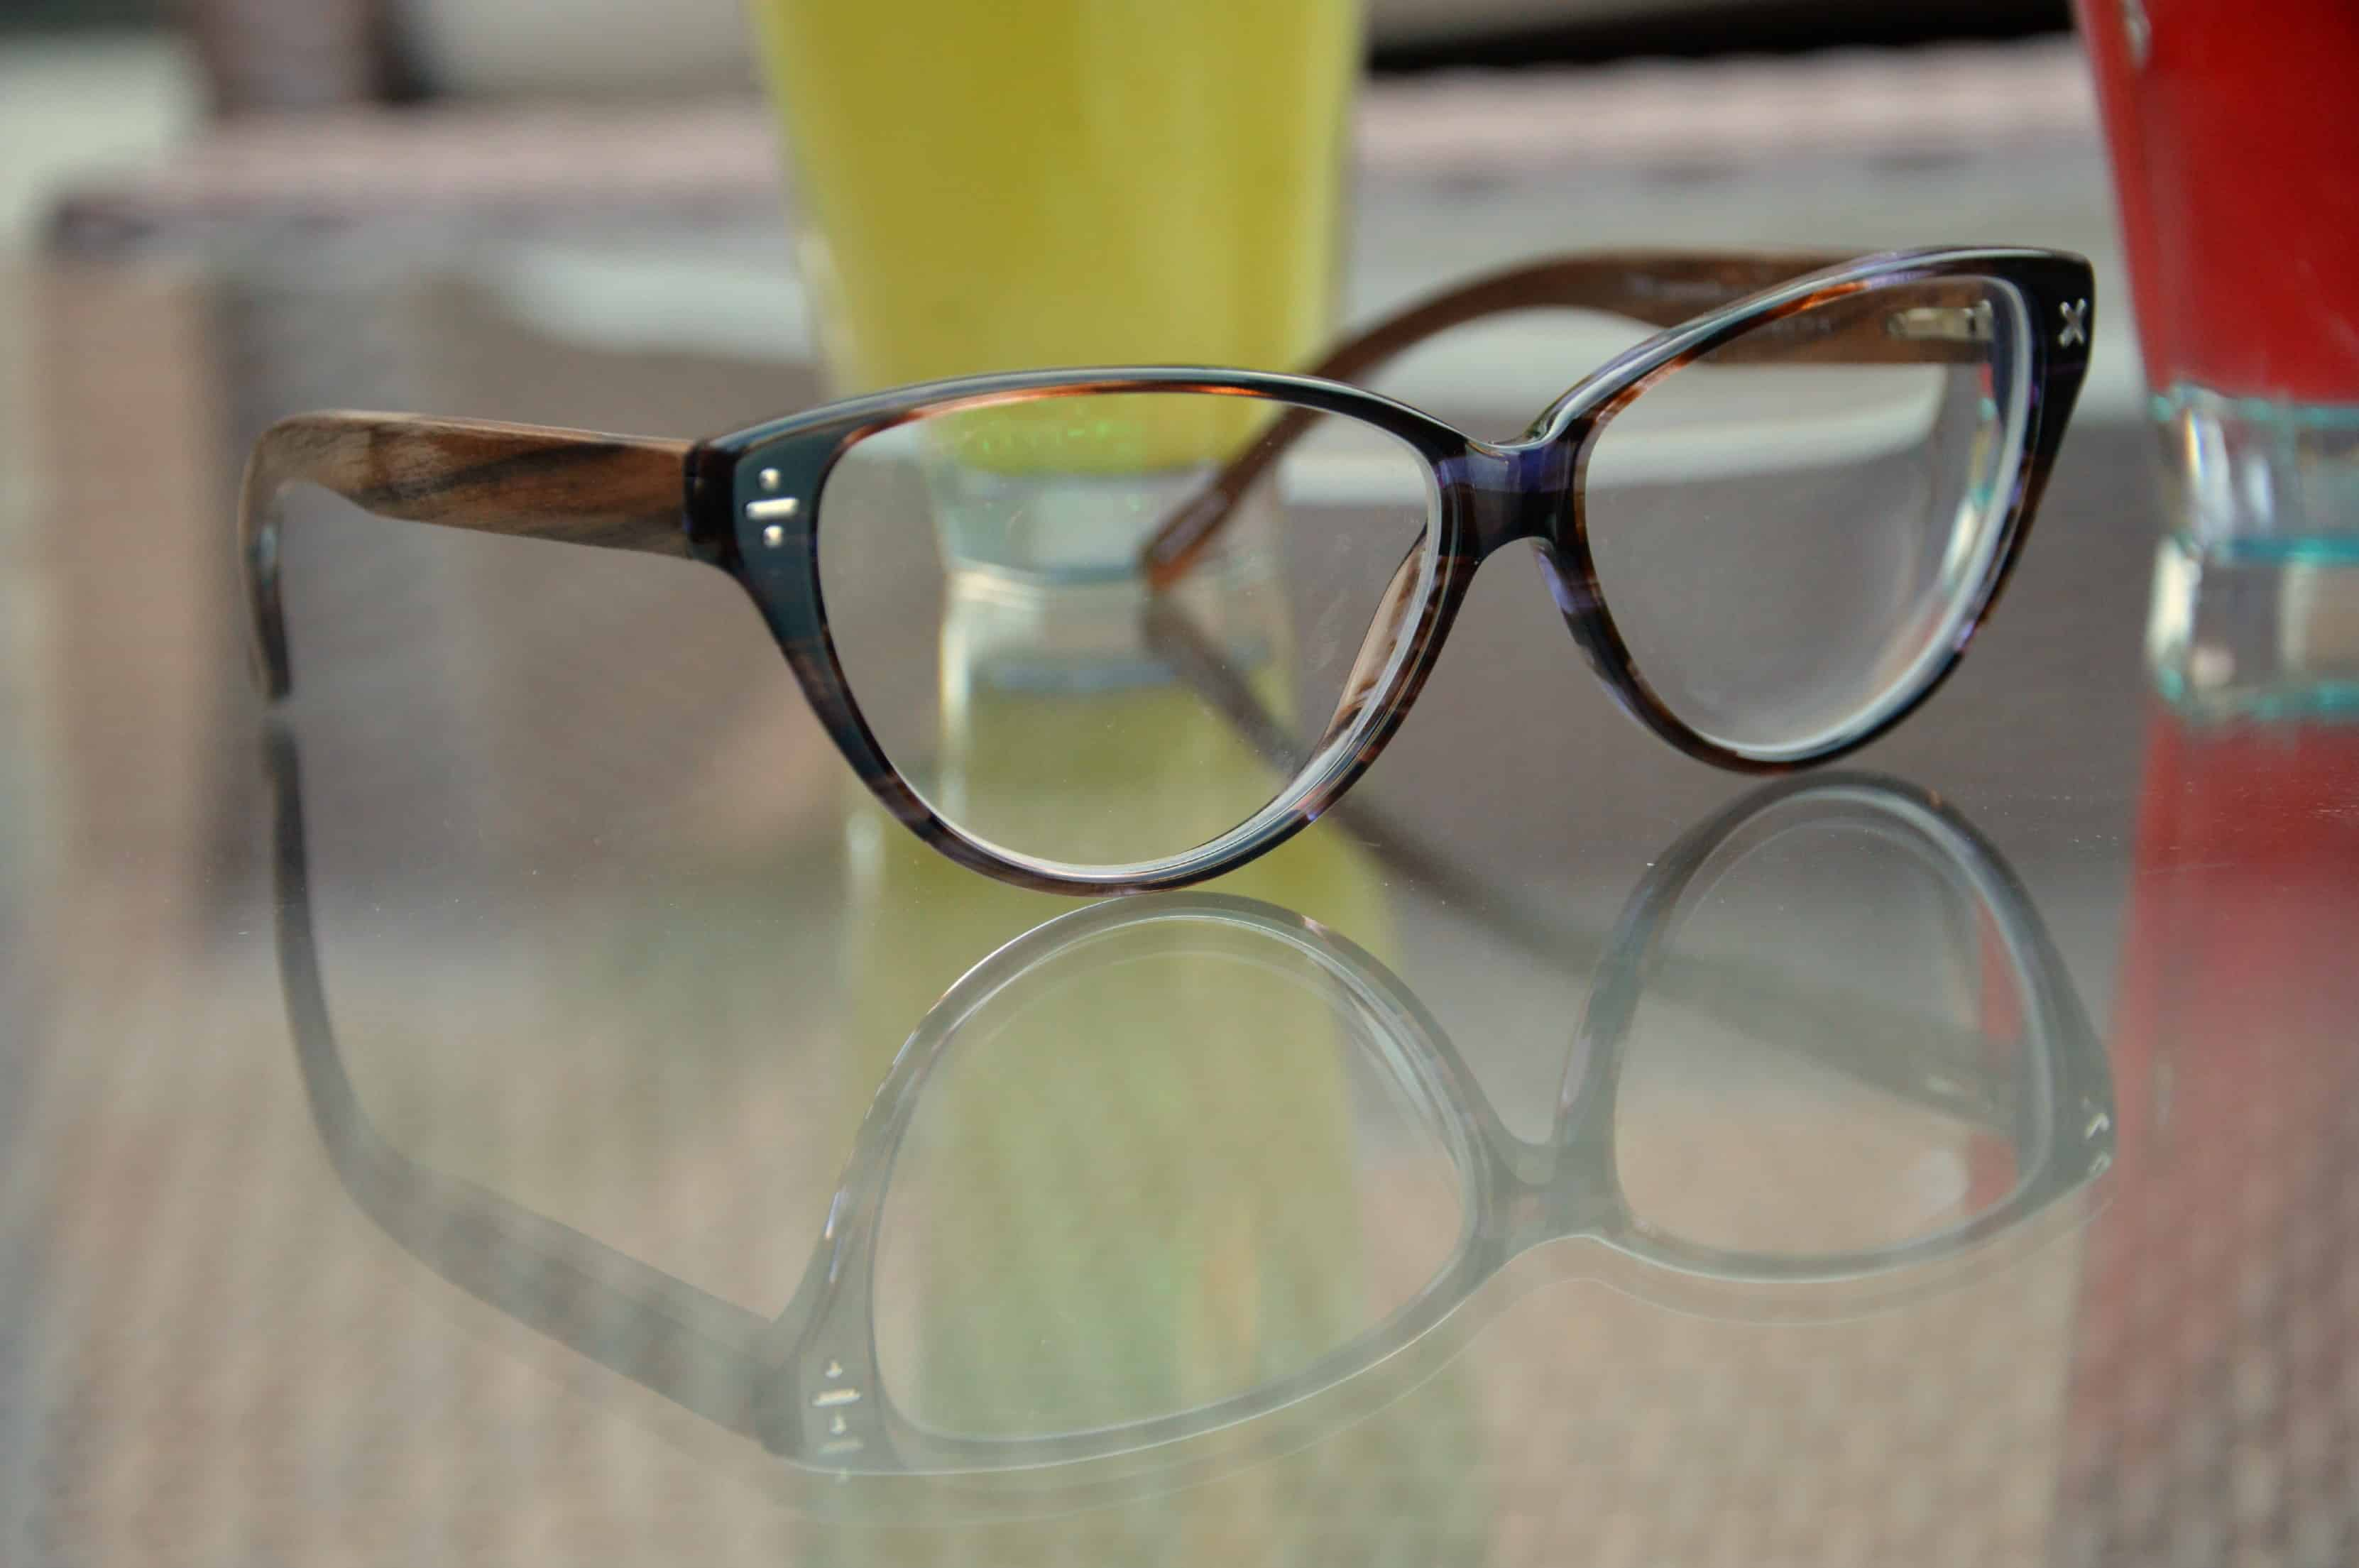 lensway-eyewear-derek-cardigan-glasses-thefashiontag-look-12